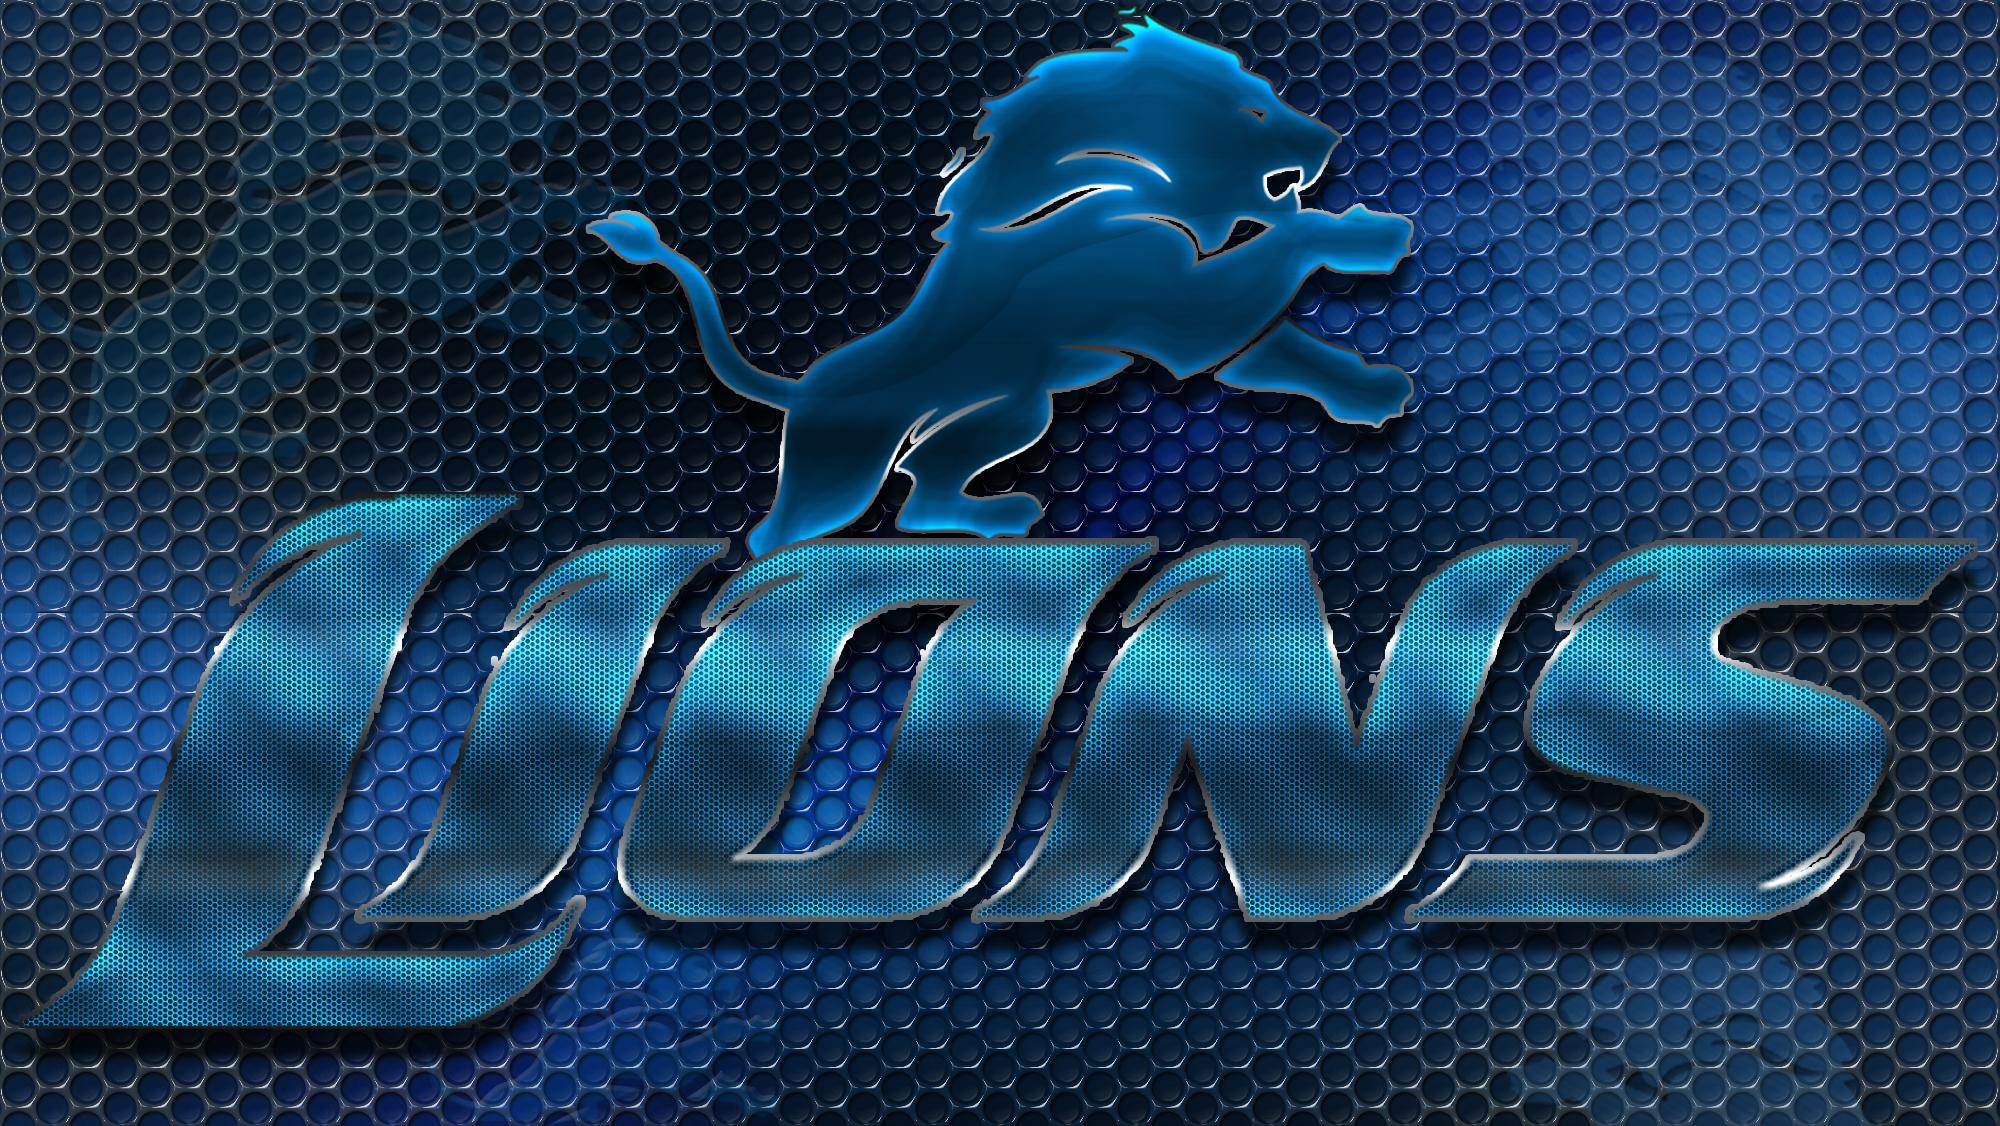 detroit lions nfl football wallpaper 2000x1126 155146